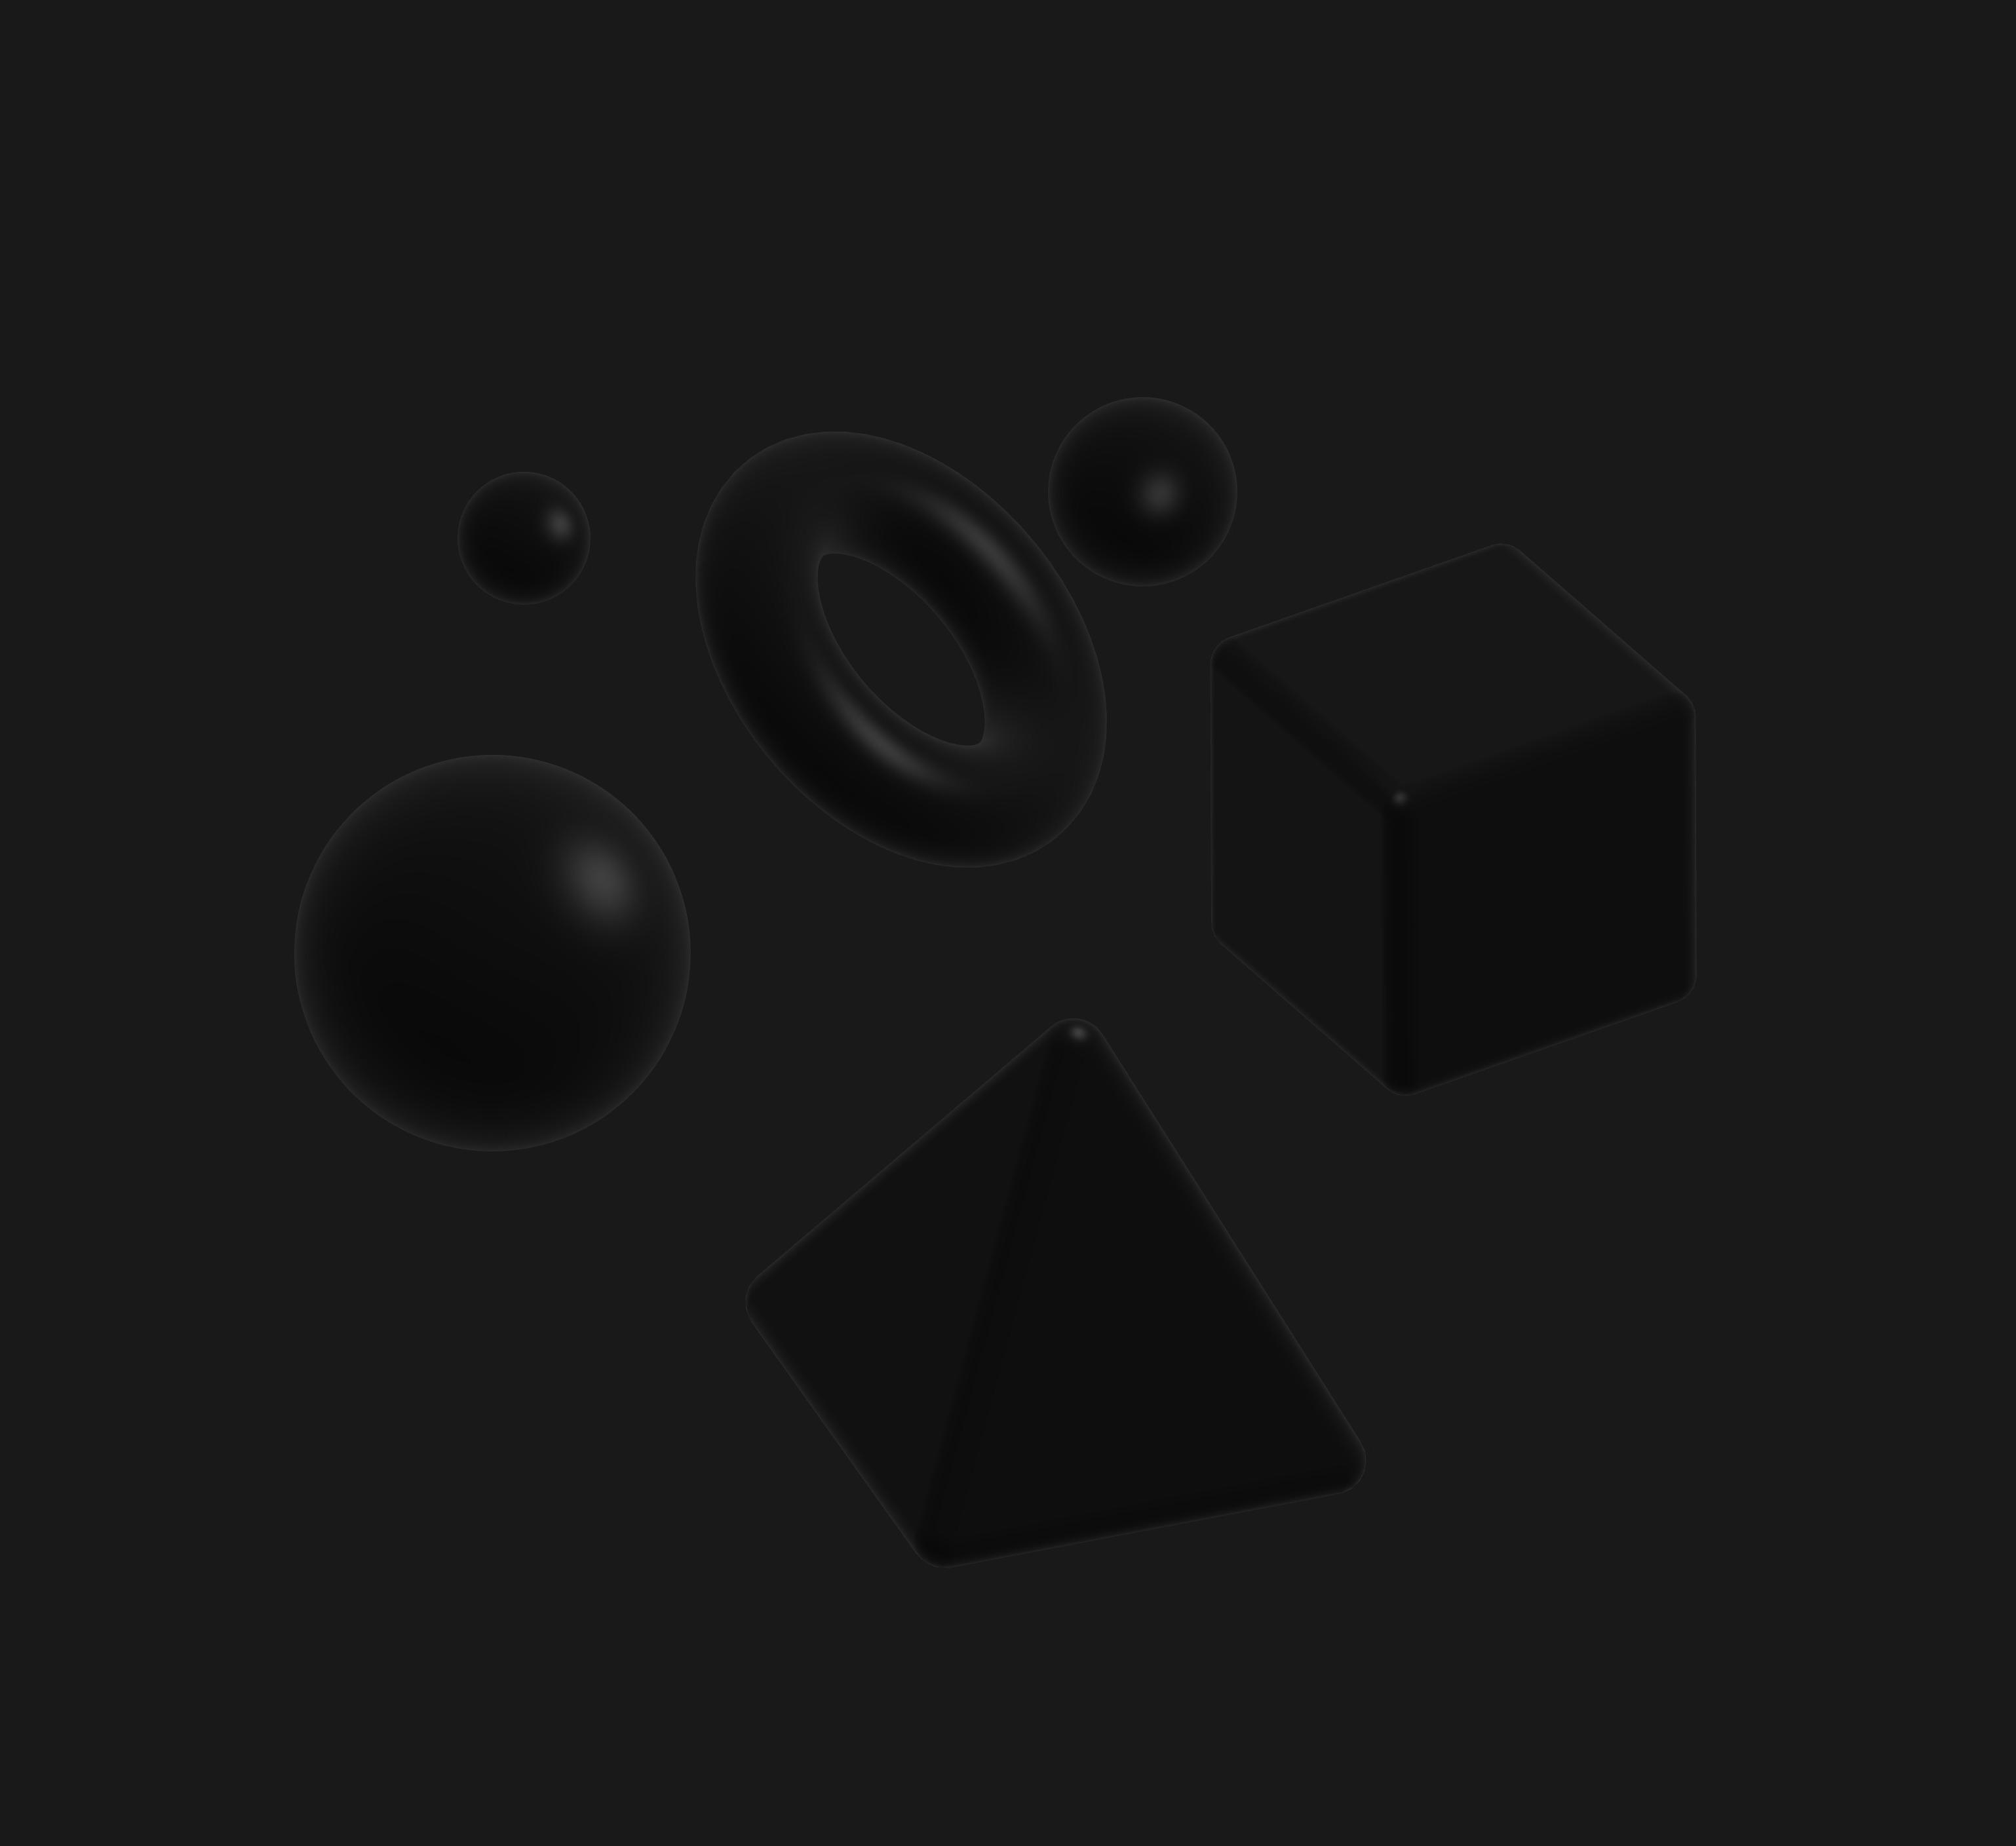 3D Experiment w/ Spline